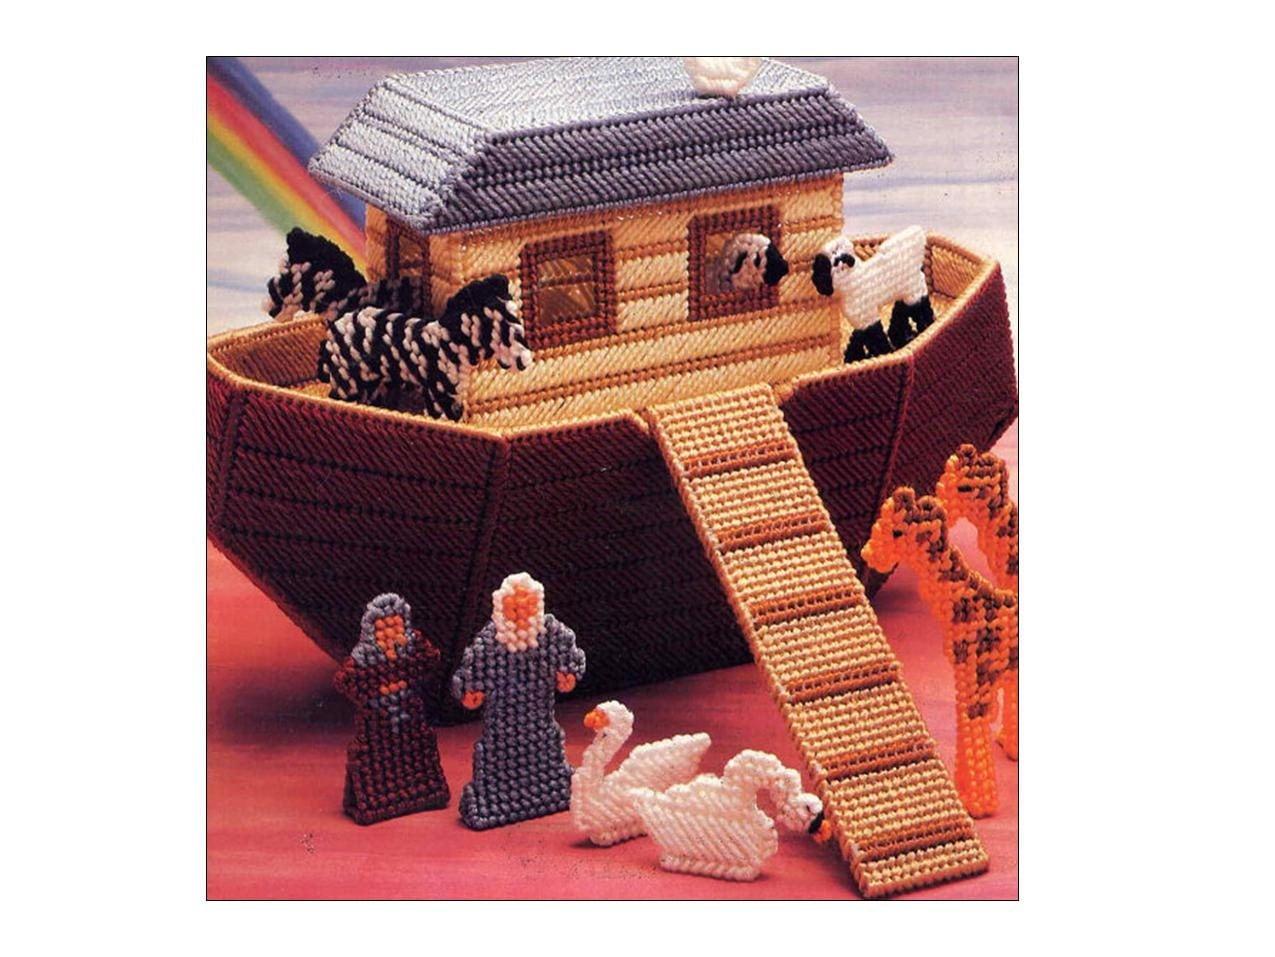 Noah S Ark Plastic Canvas Toy Playset Pattern Animals